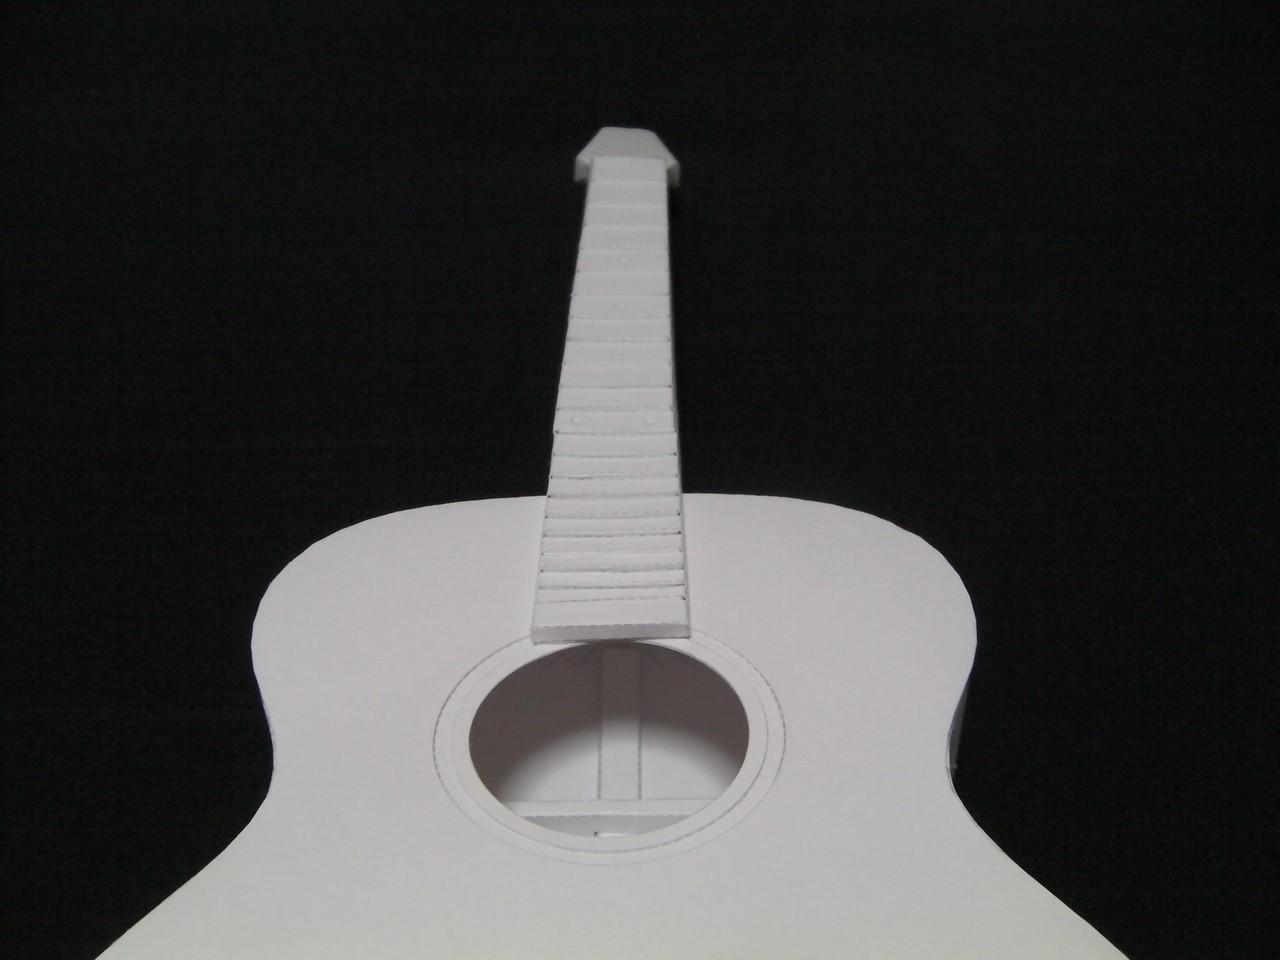 guitar_a020.jpg